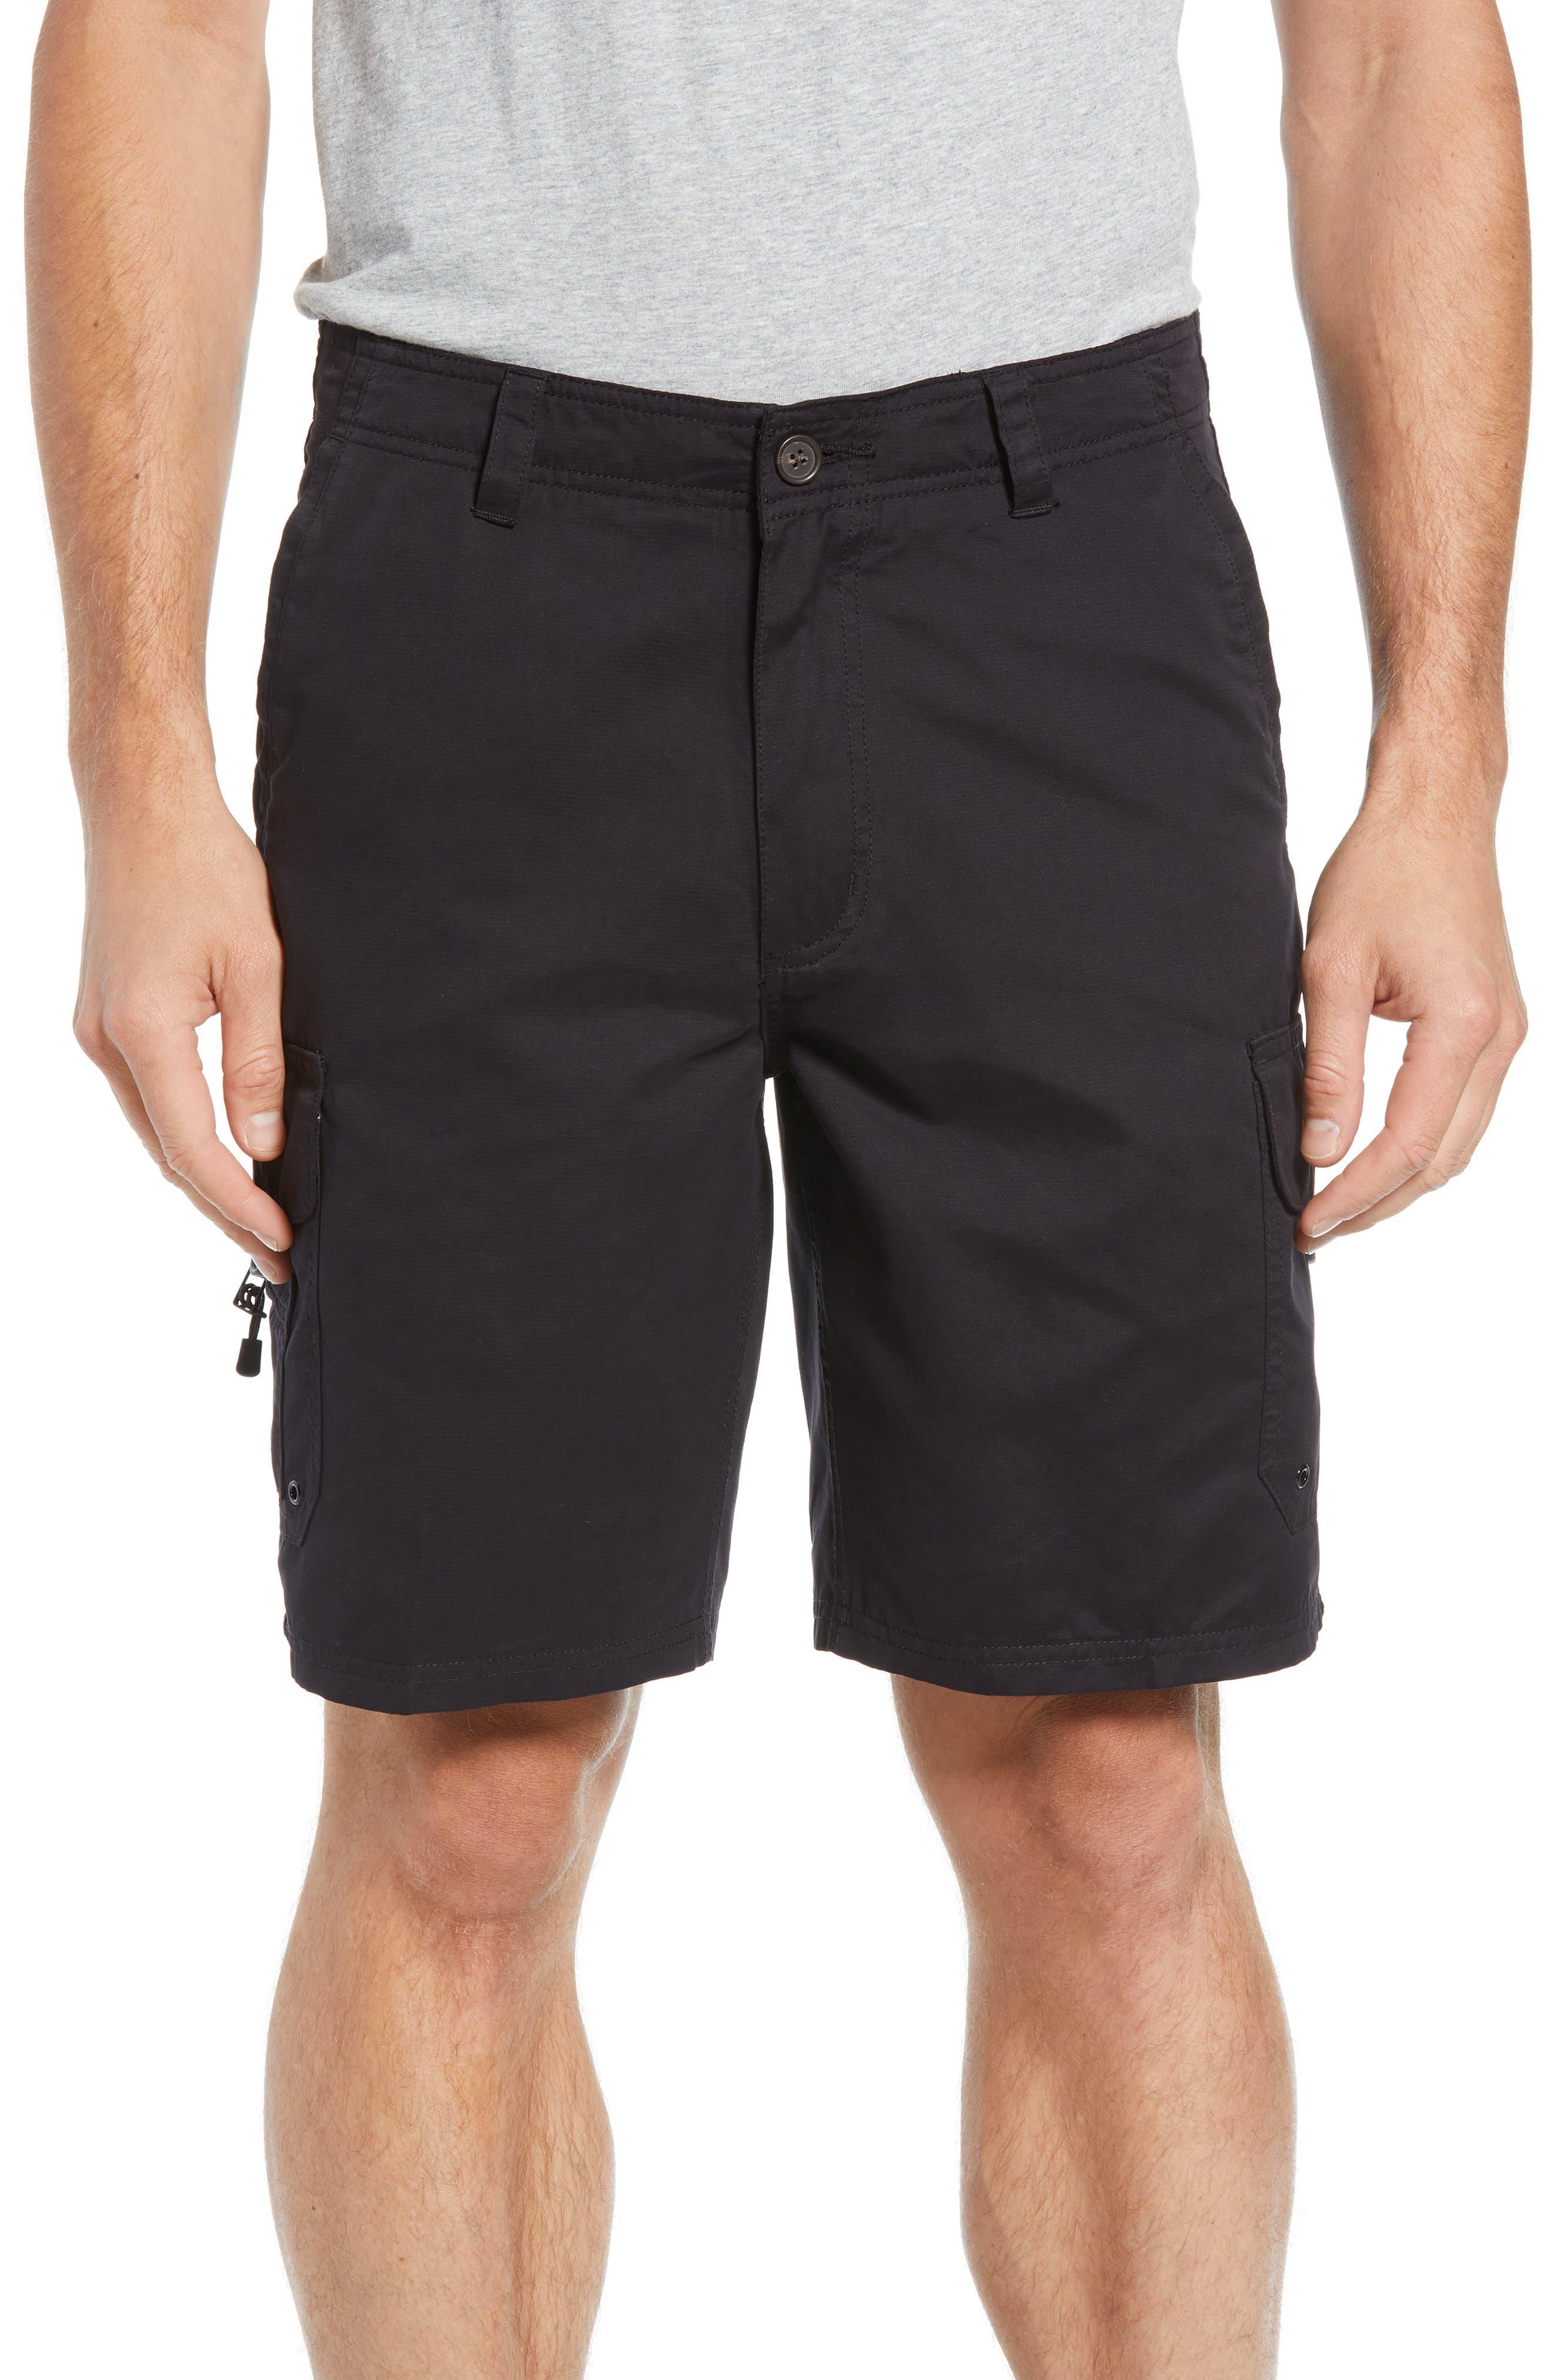 QUIKSILVER WATERMAN COLLECTION Maldive Regular Fit Cargo Shorts, Main, color, 001